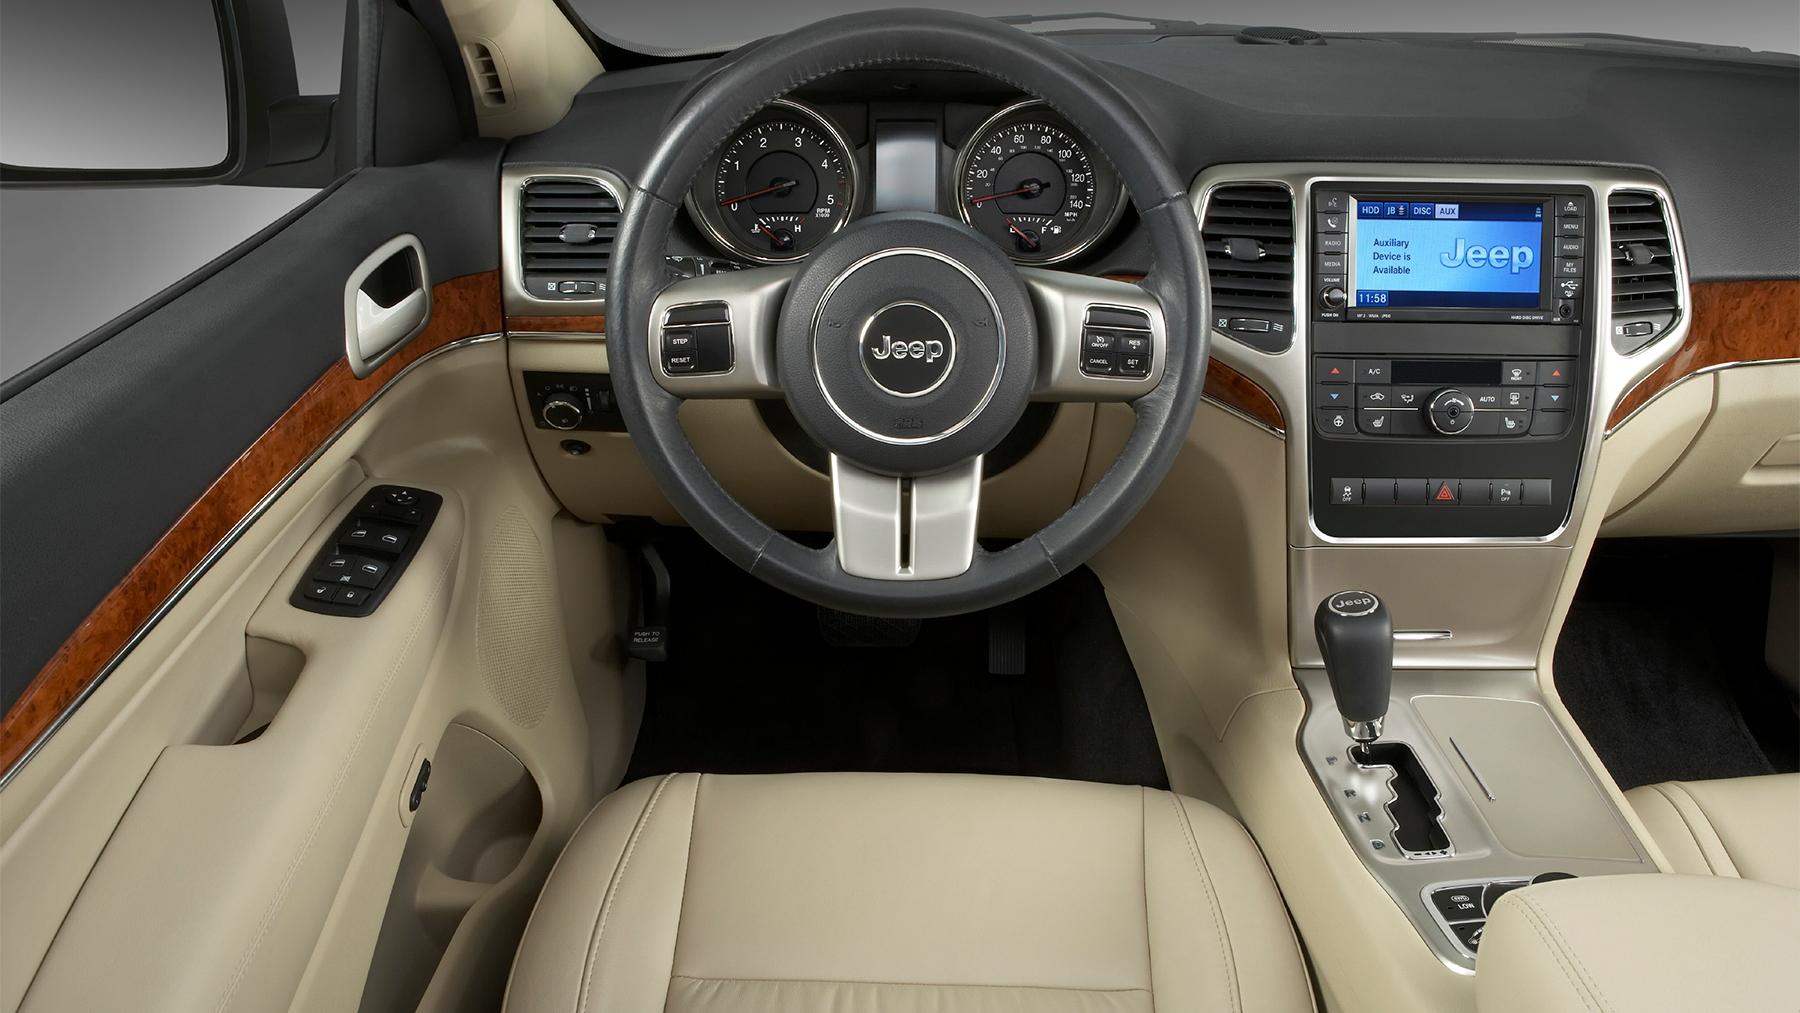 2011 jeep grand cherokee 011